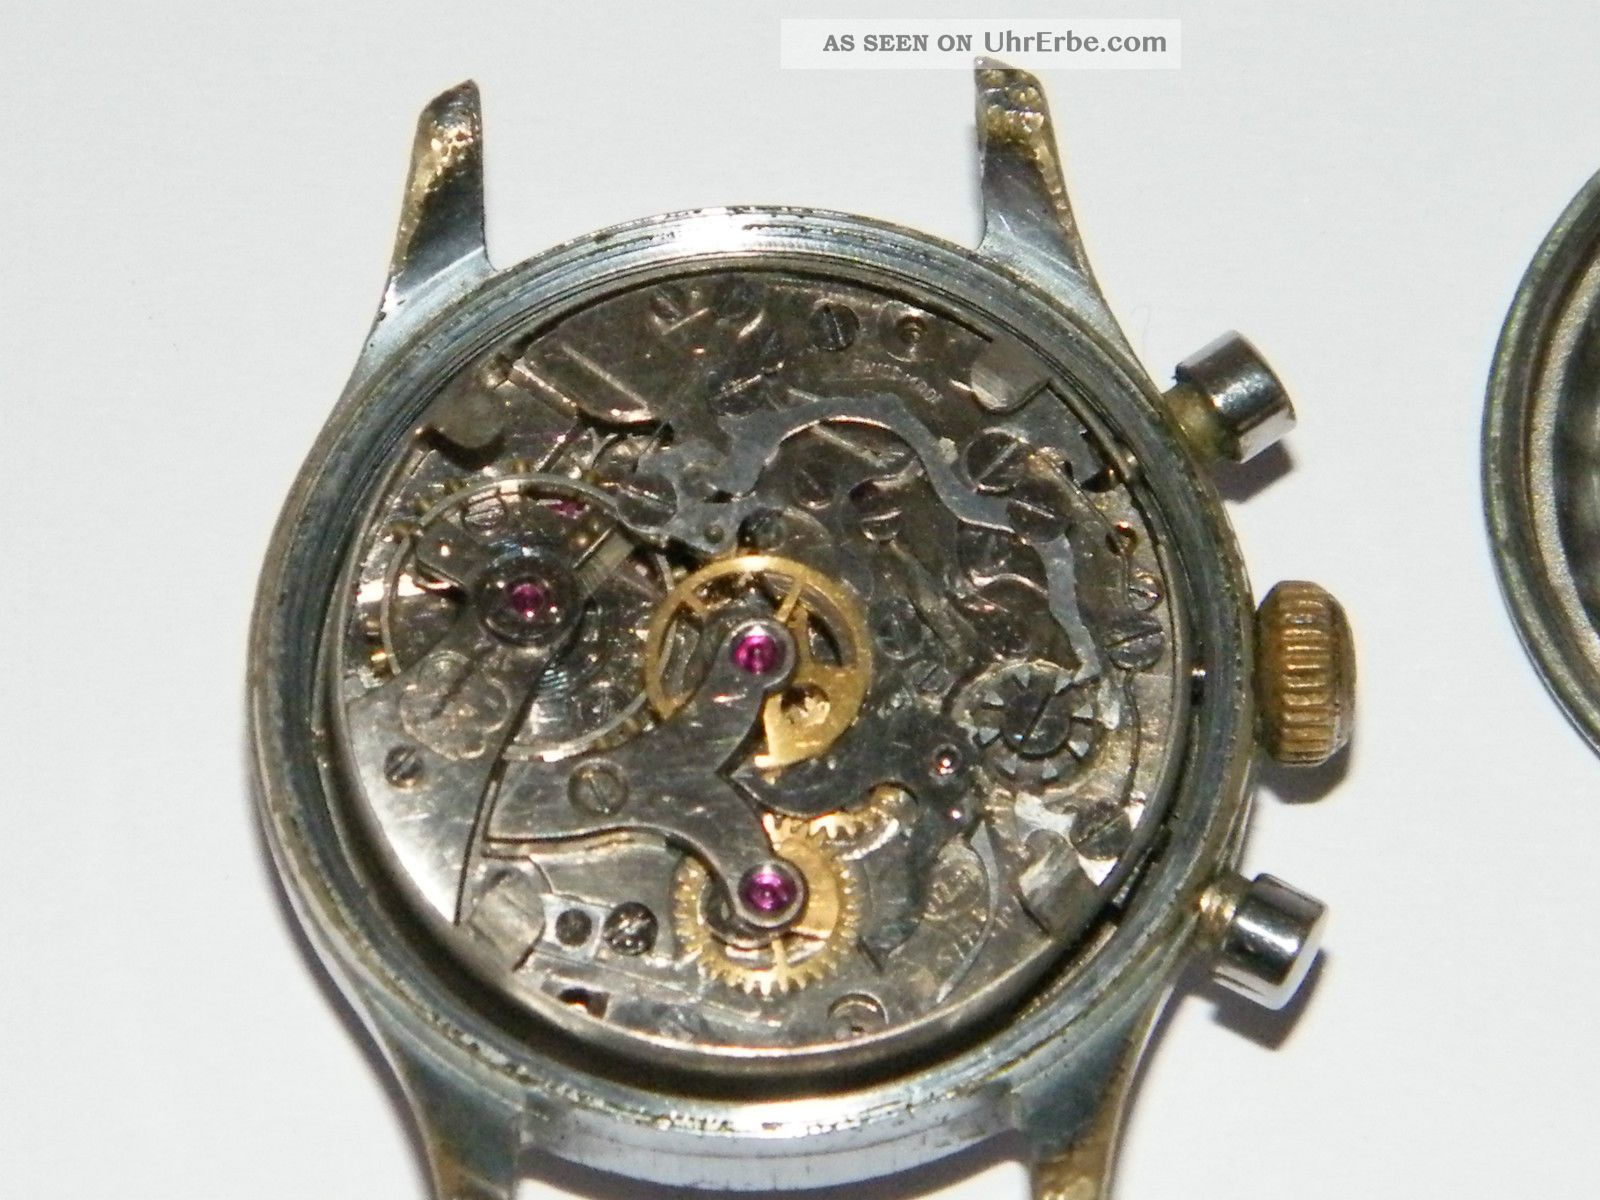 Elmo Chronograph Vintage Handaufzug, Wrist Watch, Repair ...